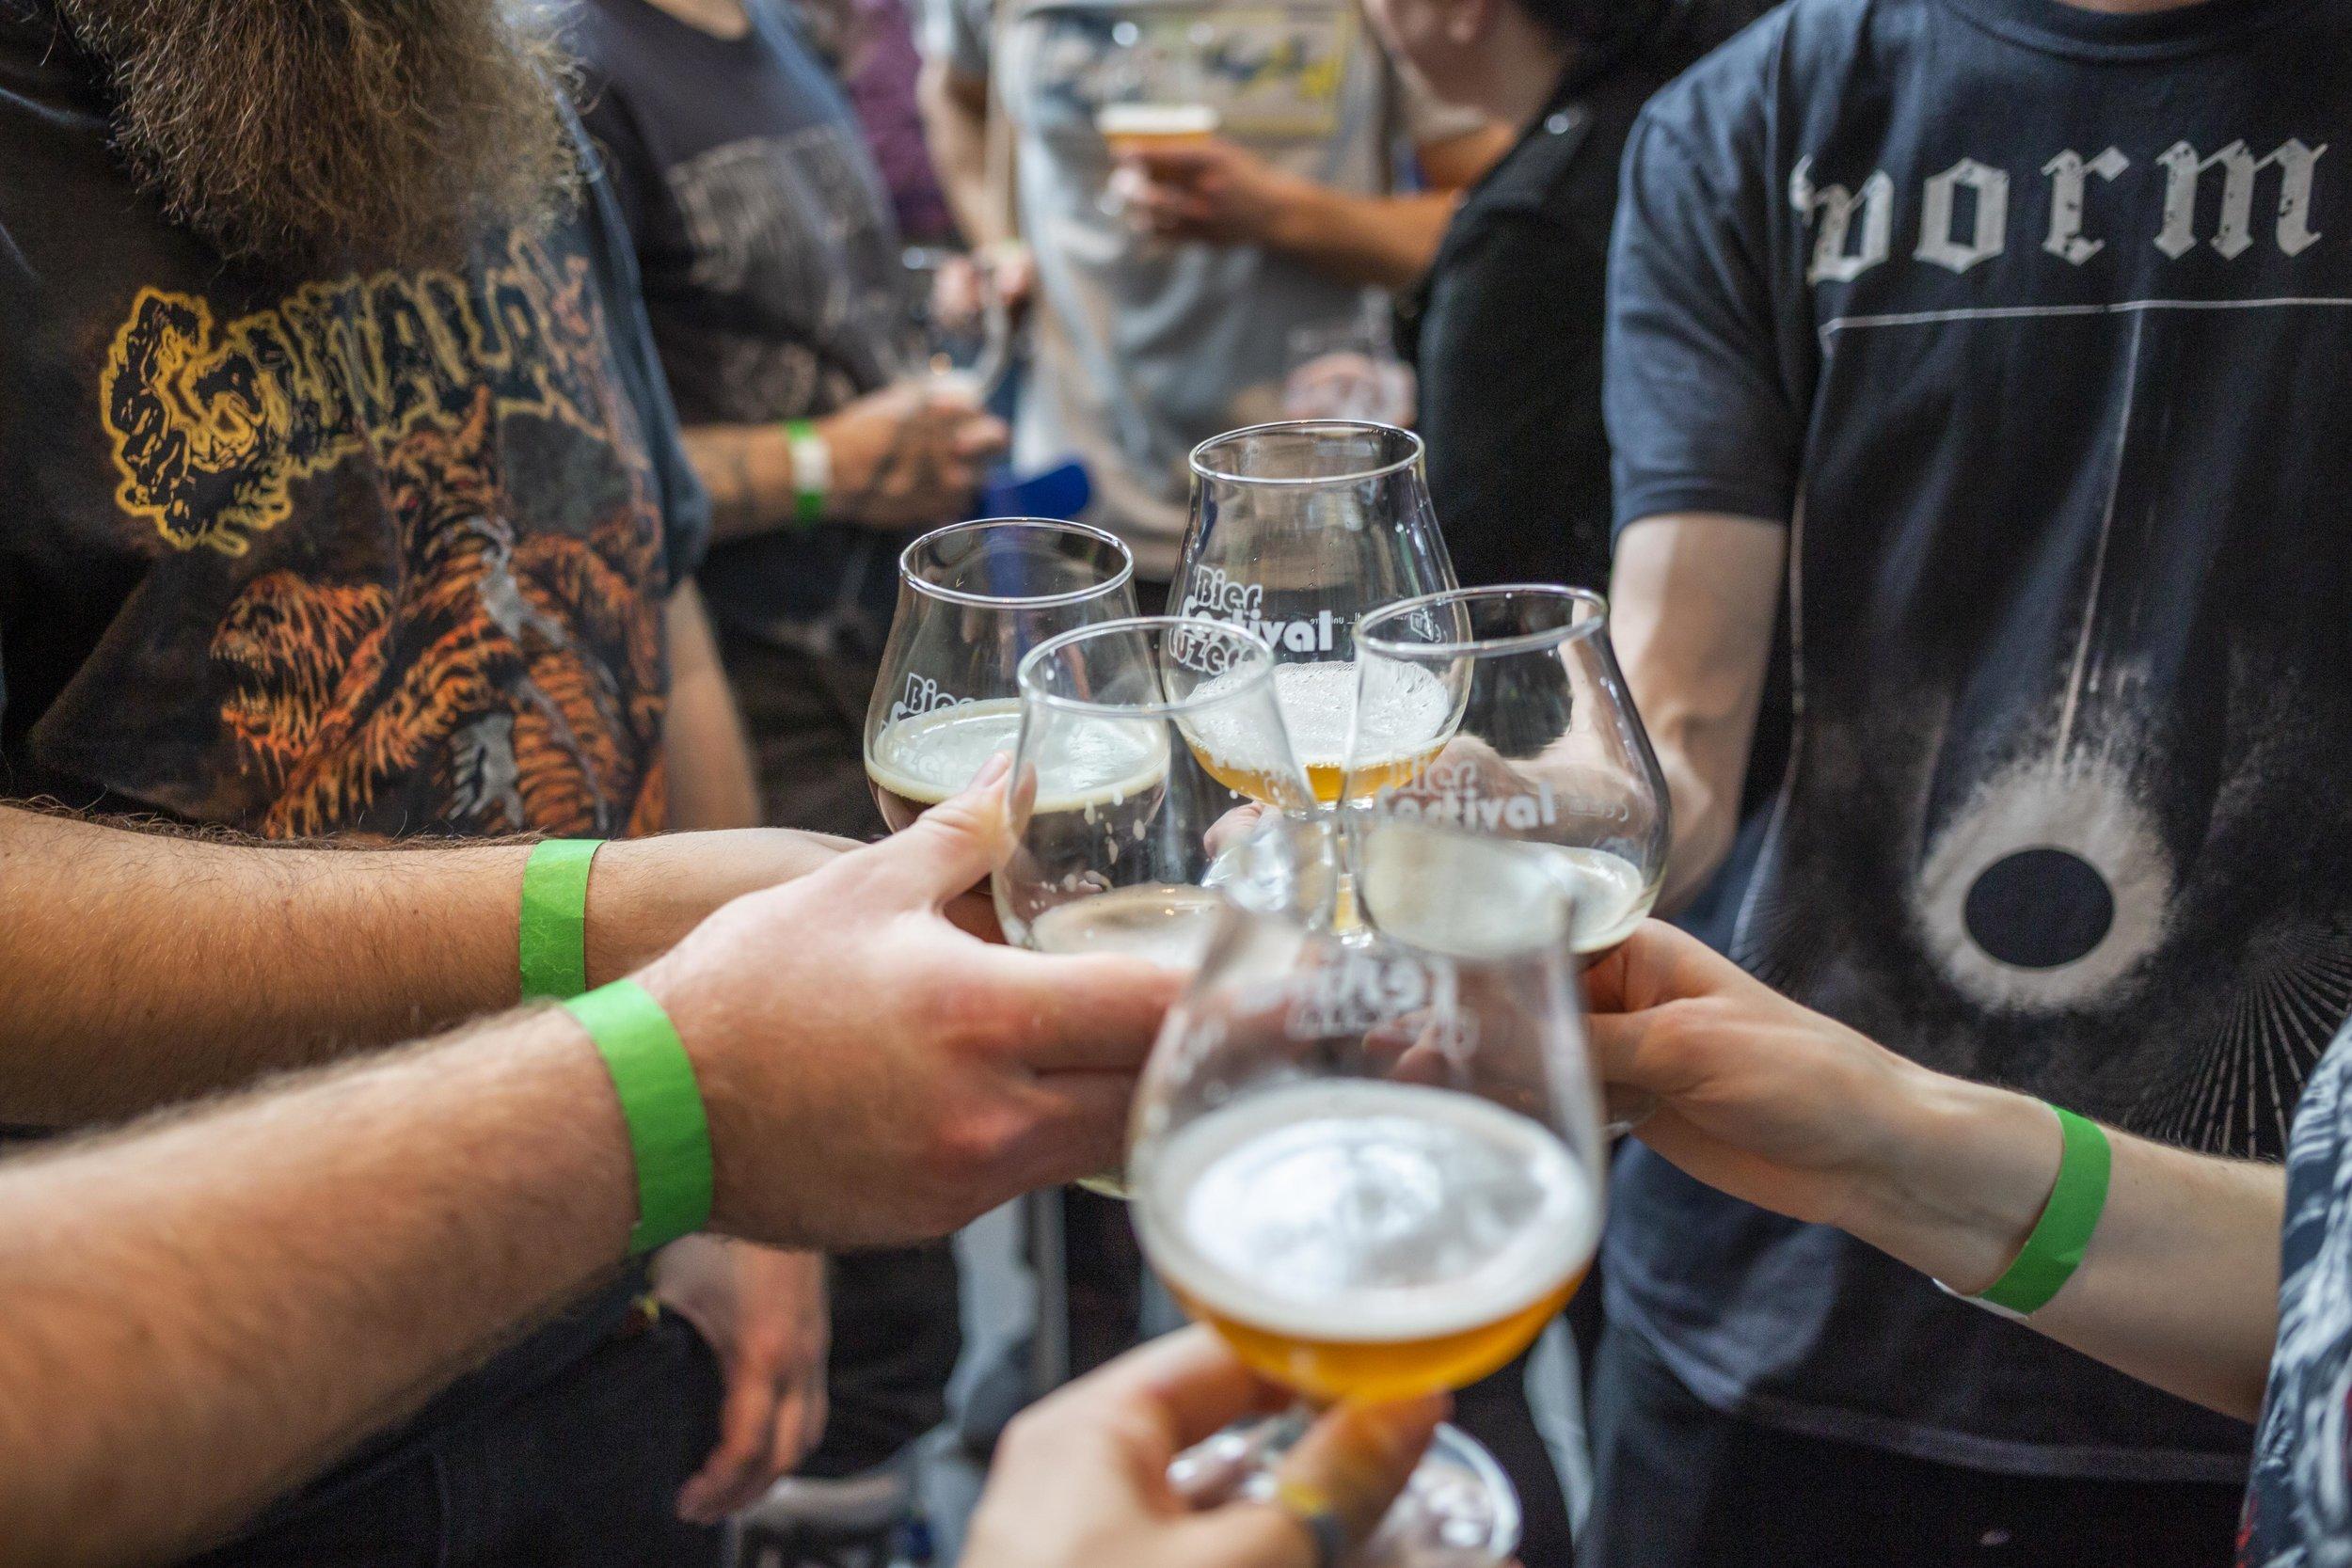 BierfestivalLuzern-5.jpg